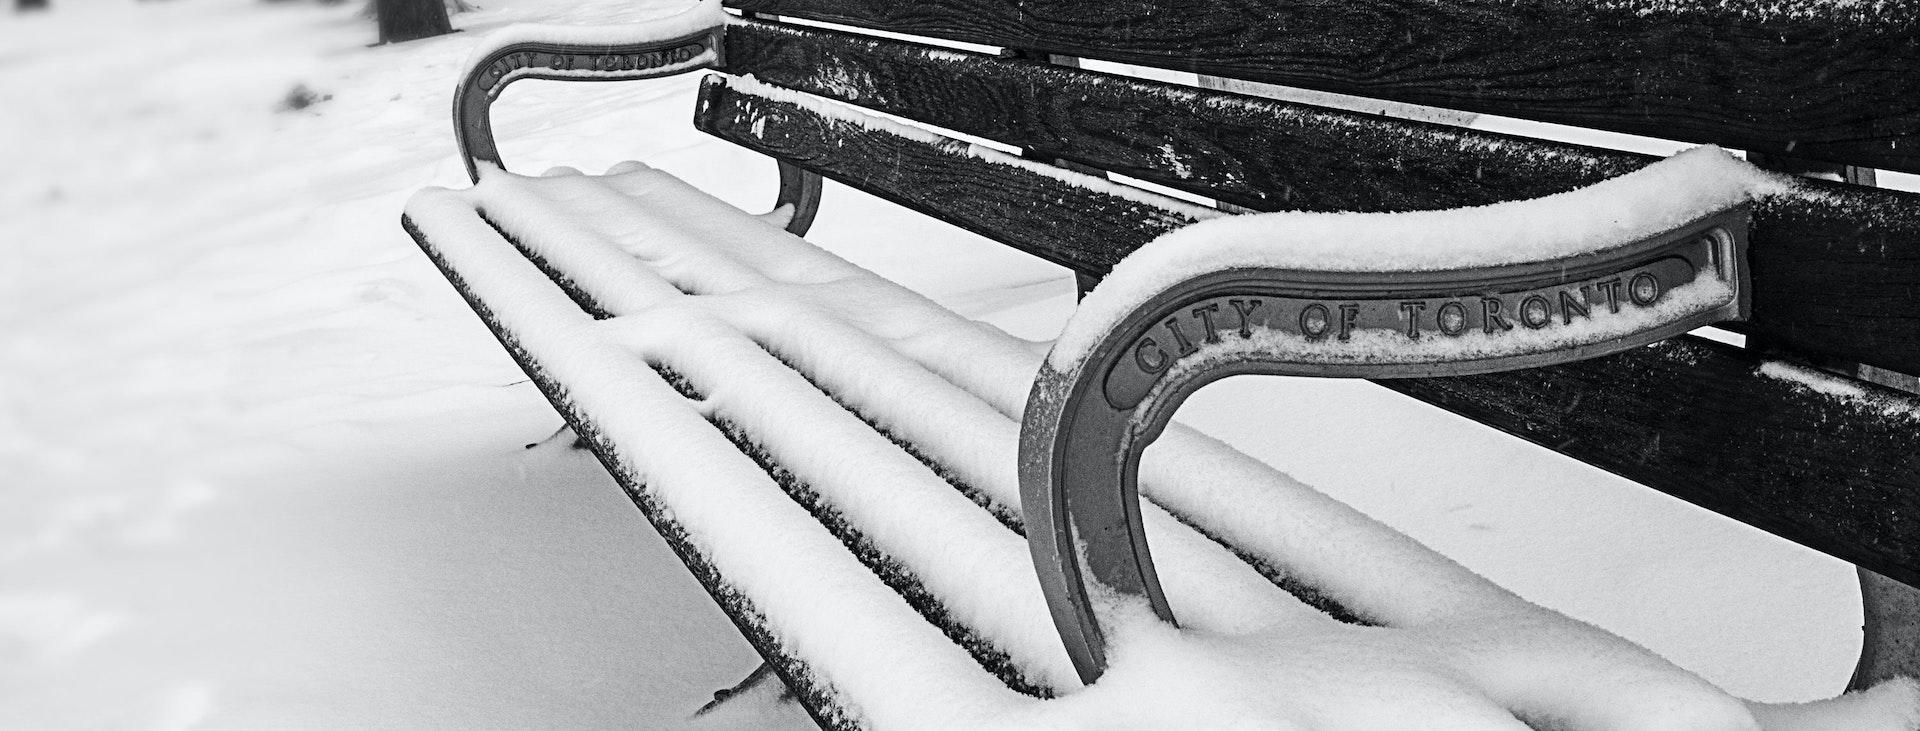 Snowy City of Toronto bench